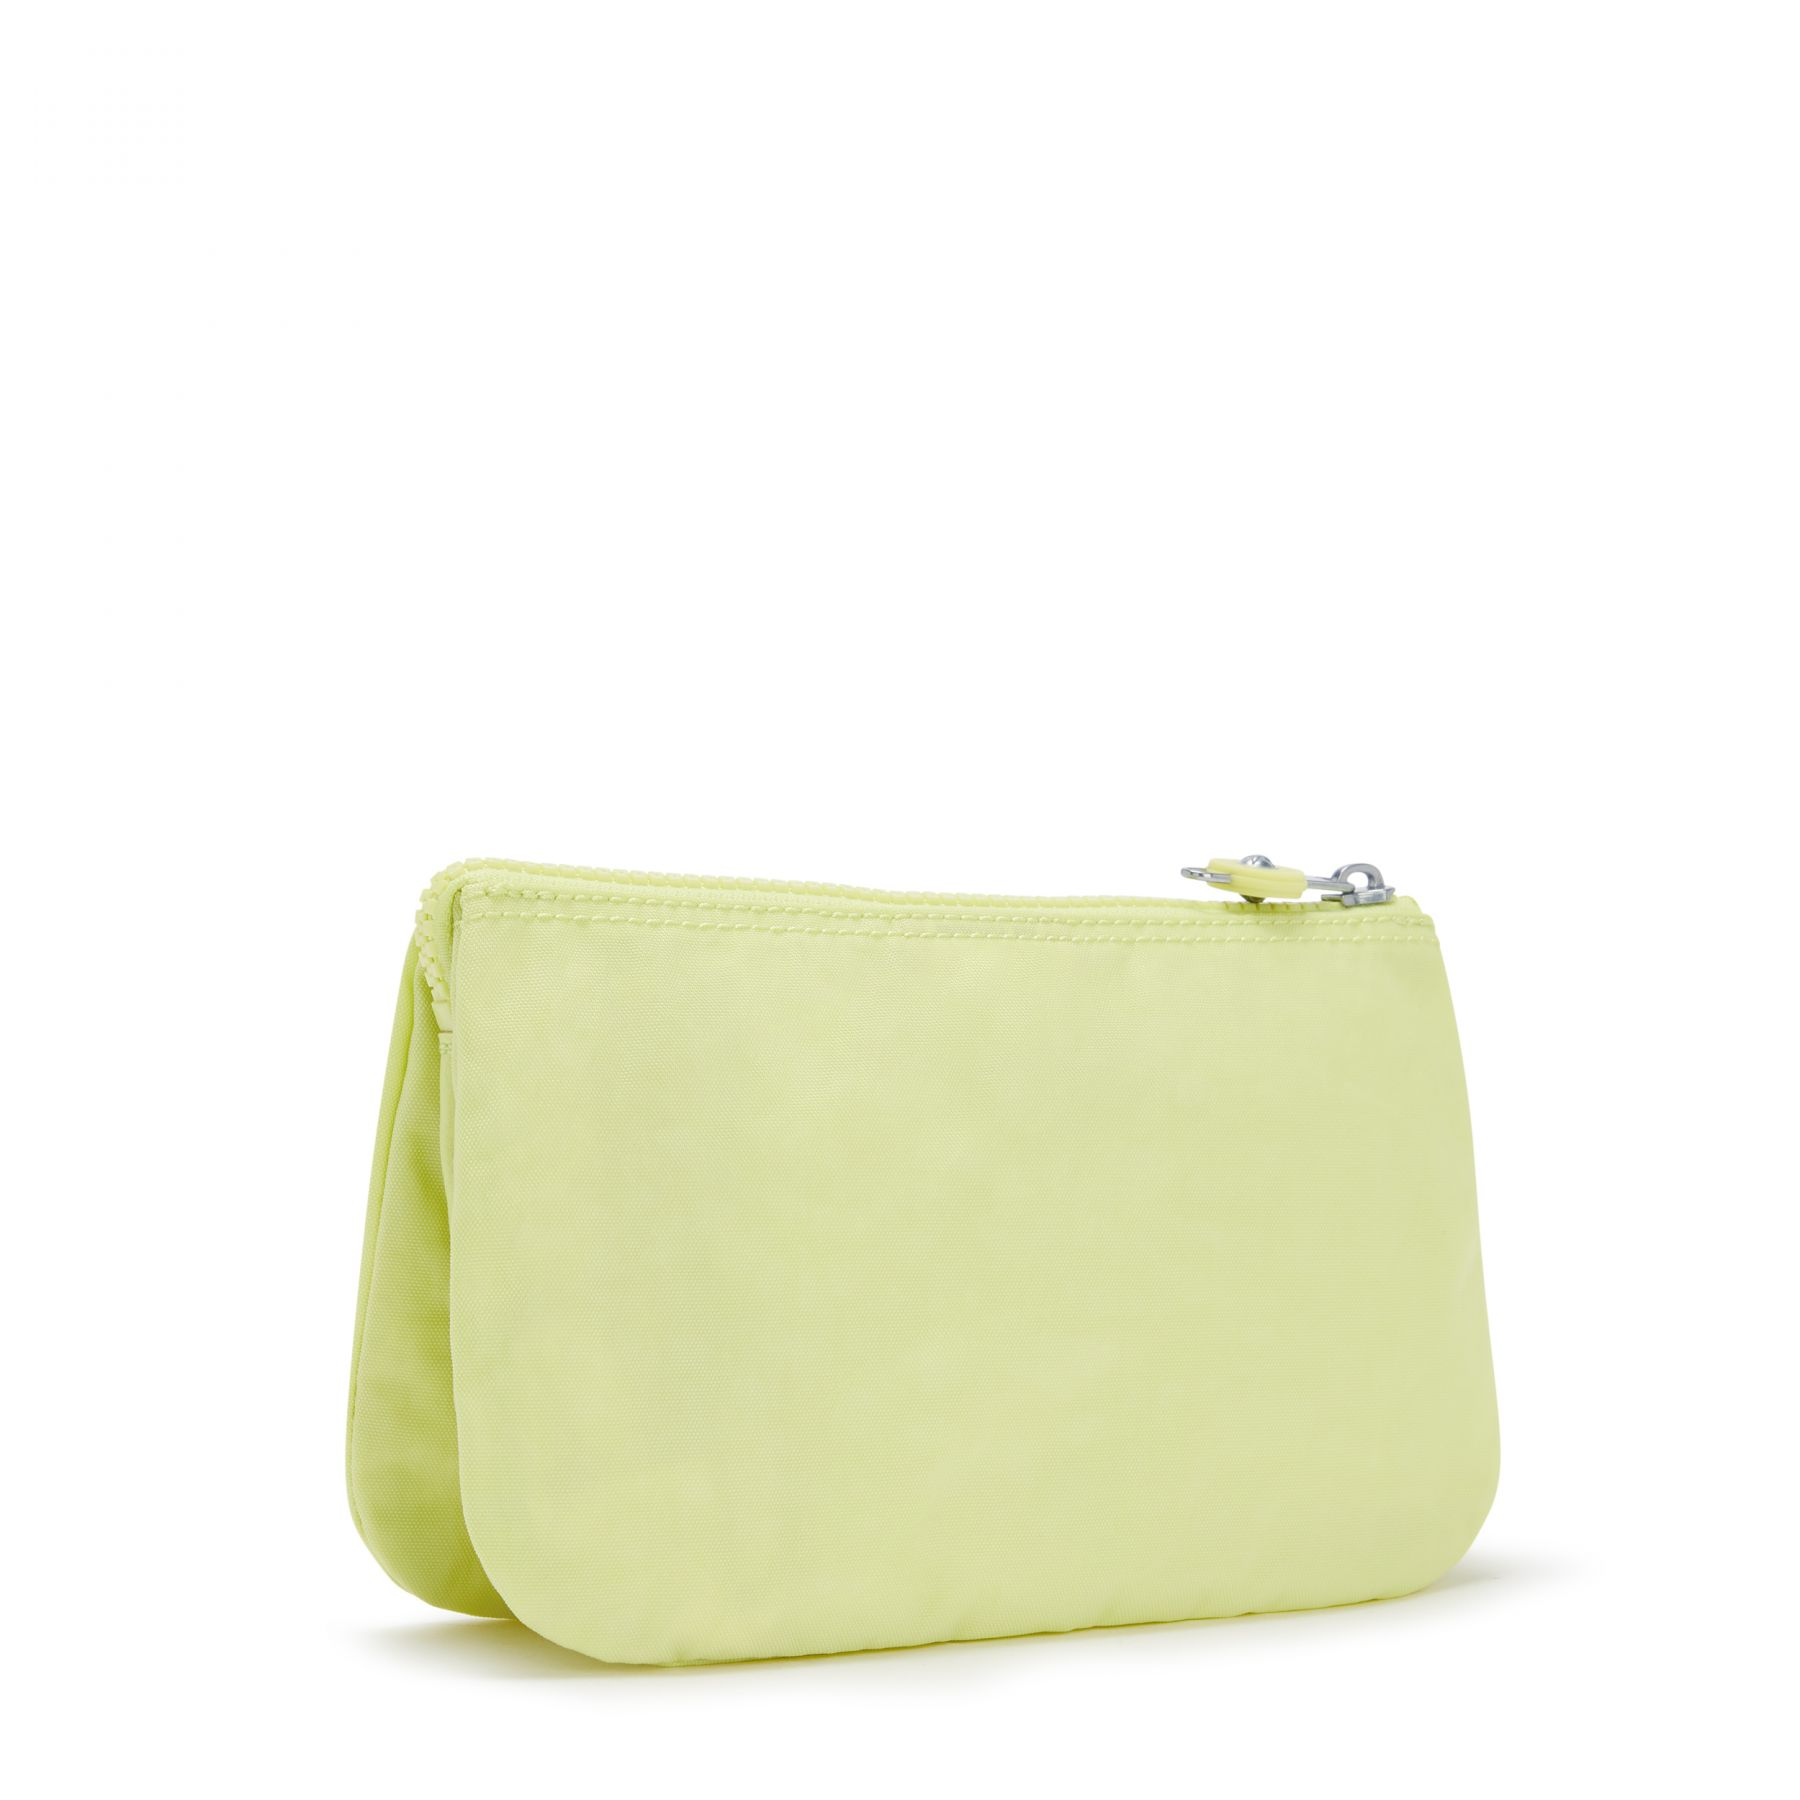 CREATIVITY XL Lime Green by Kipling